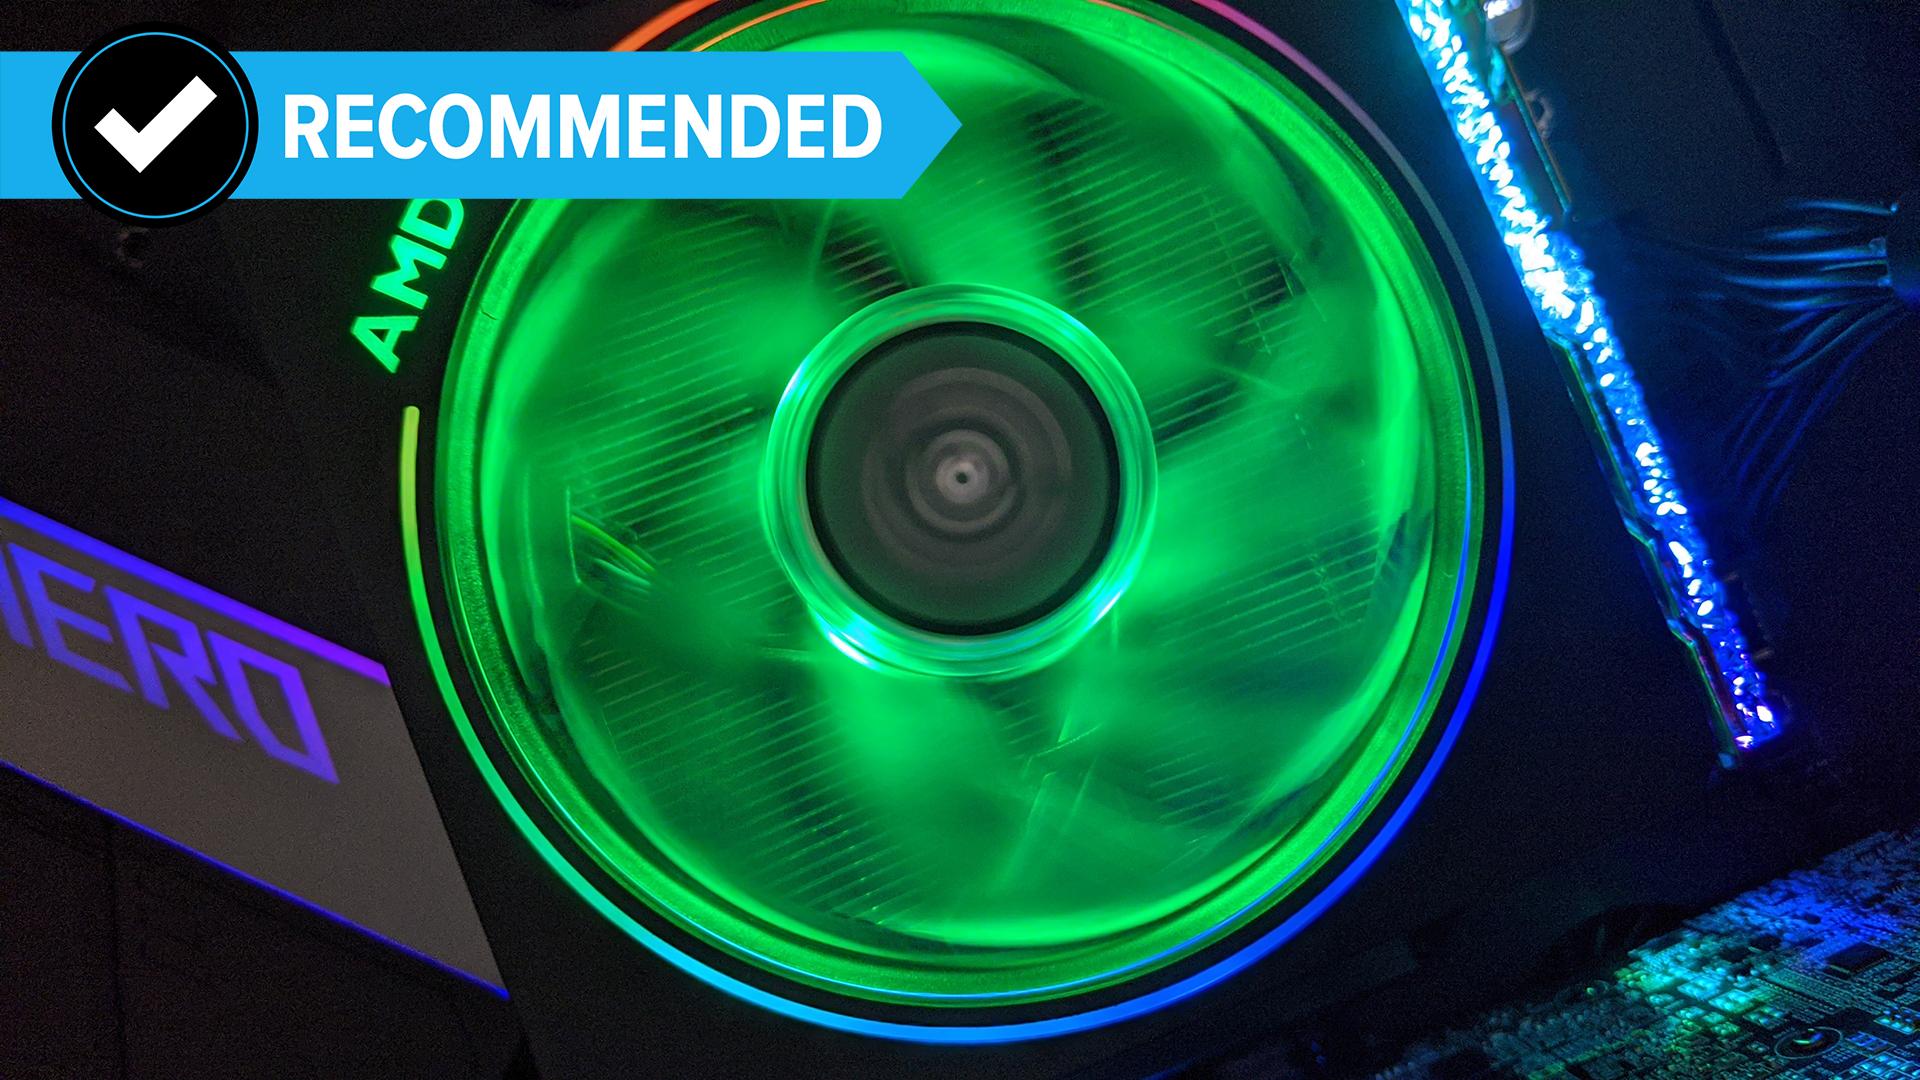 Ventoinha no AMD Ryzen 3